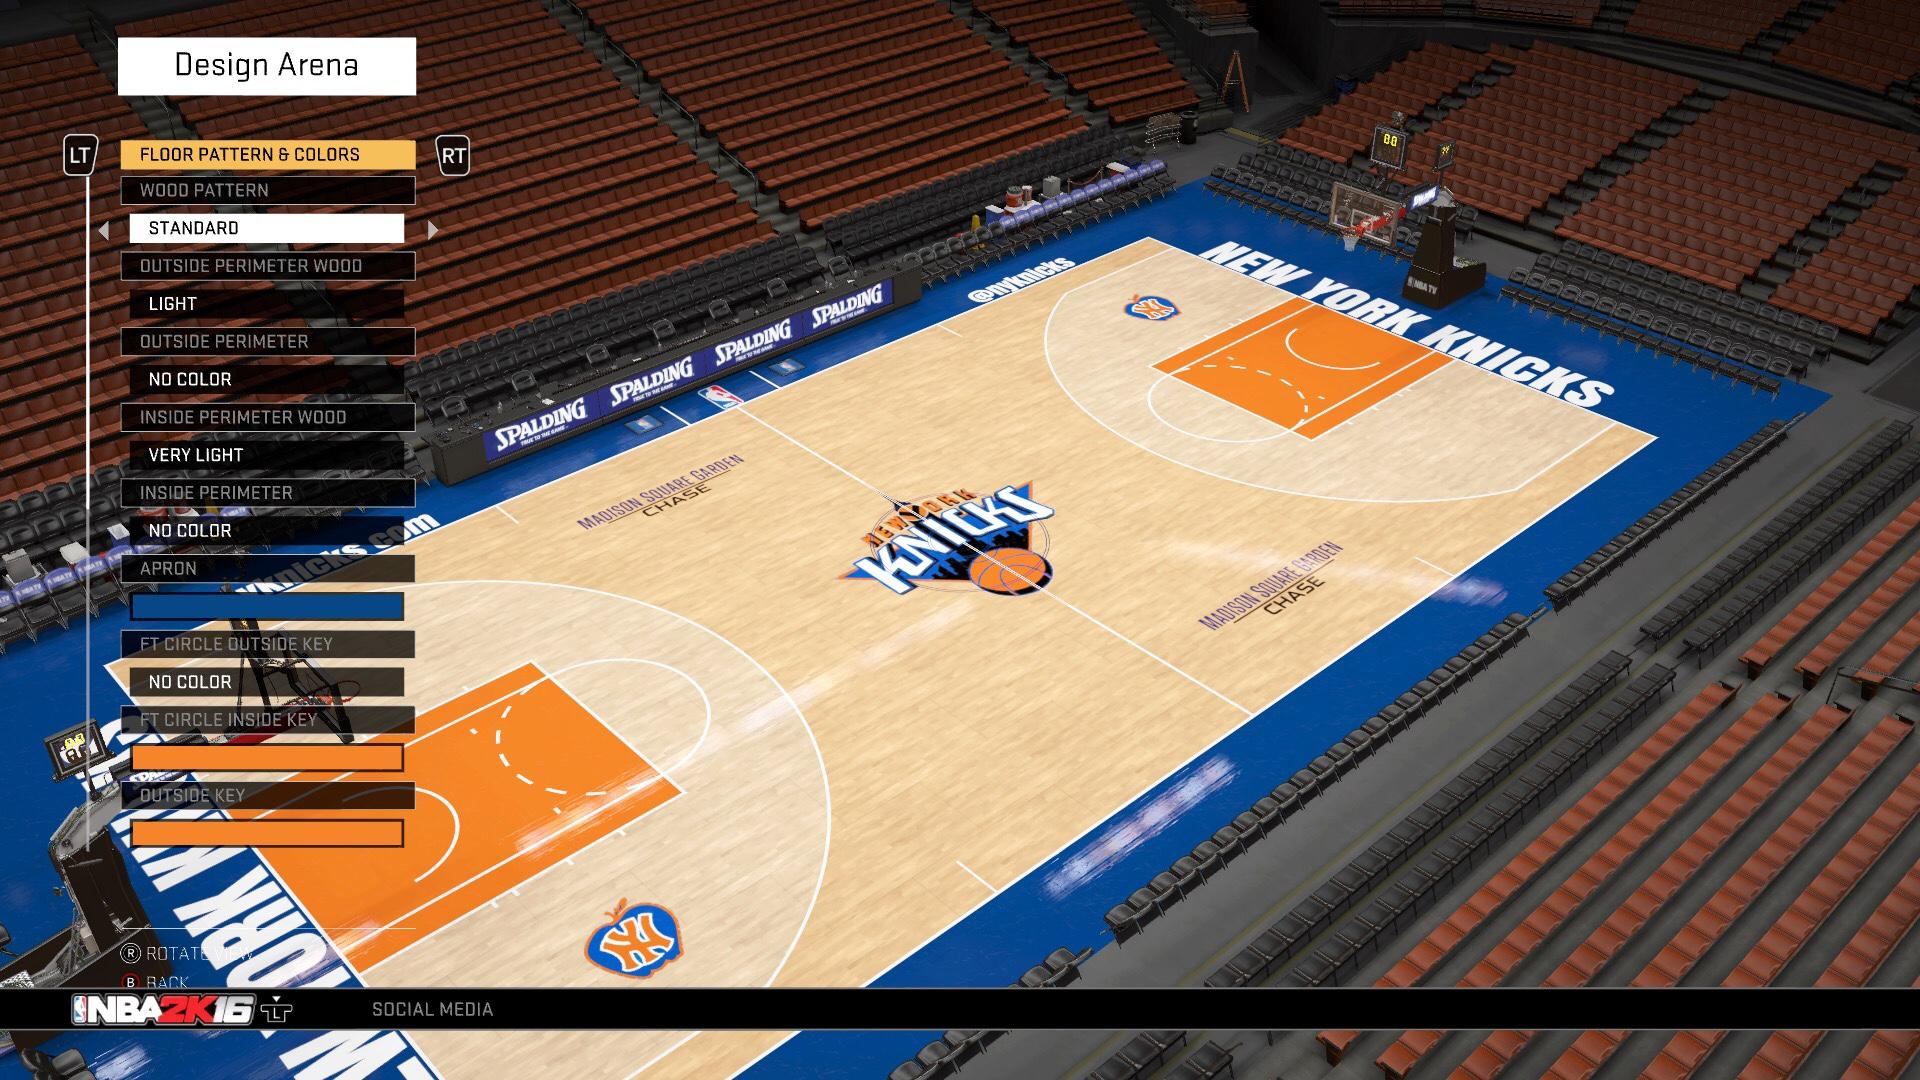 Nba Basketball New York Knicks: NBA 2K16 Court Designs And Jersey Creations.